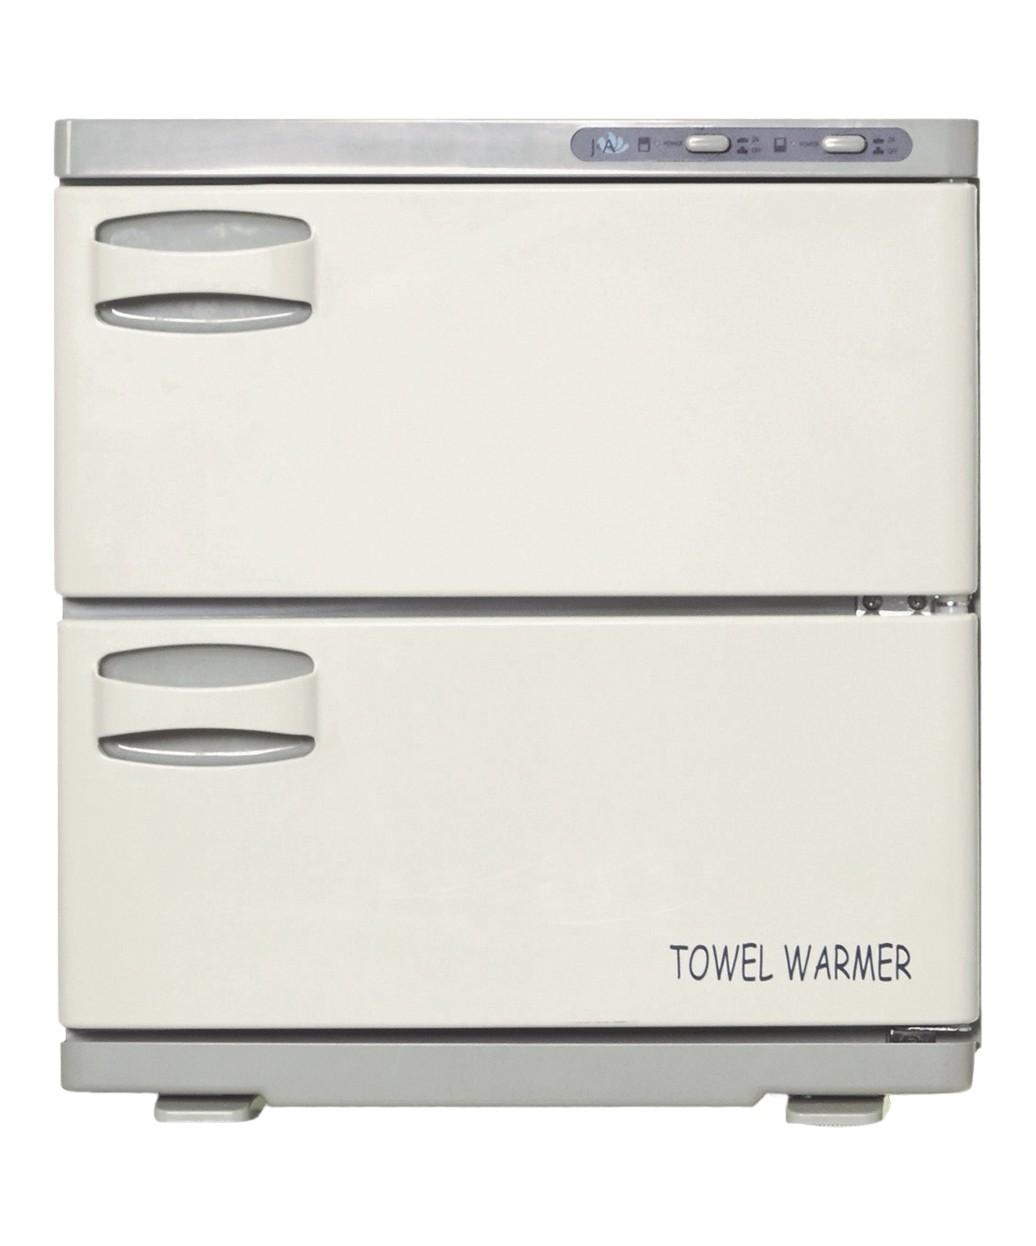 J&A Hot Towel Warmer - Large